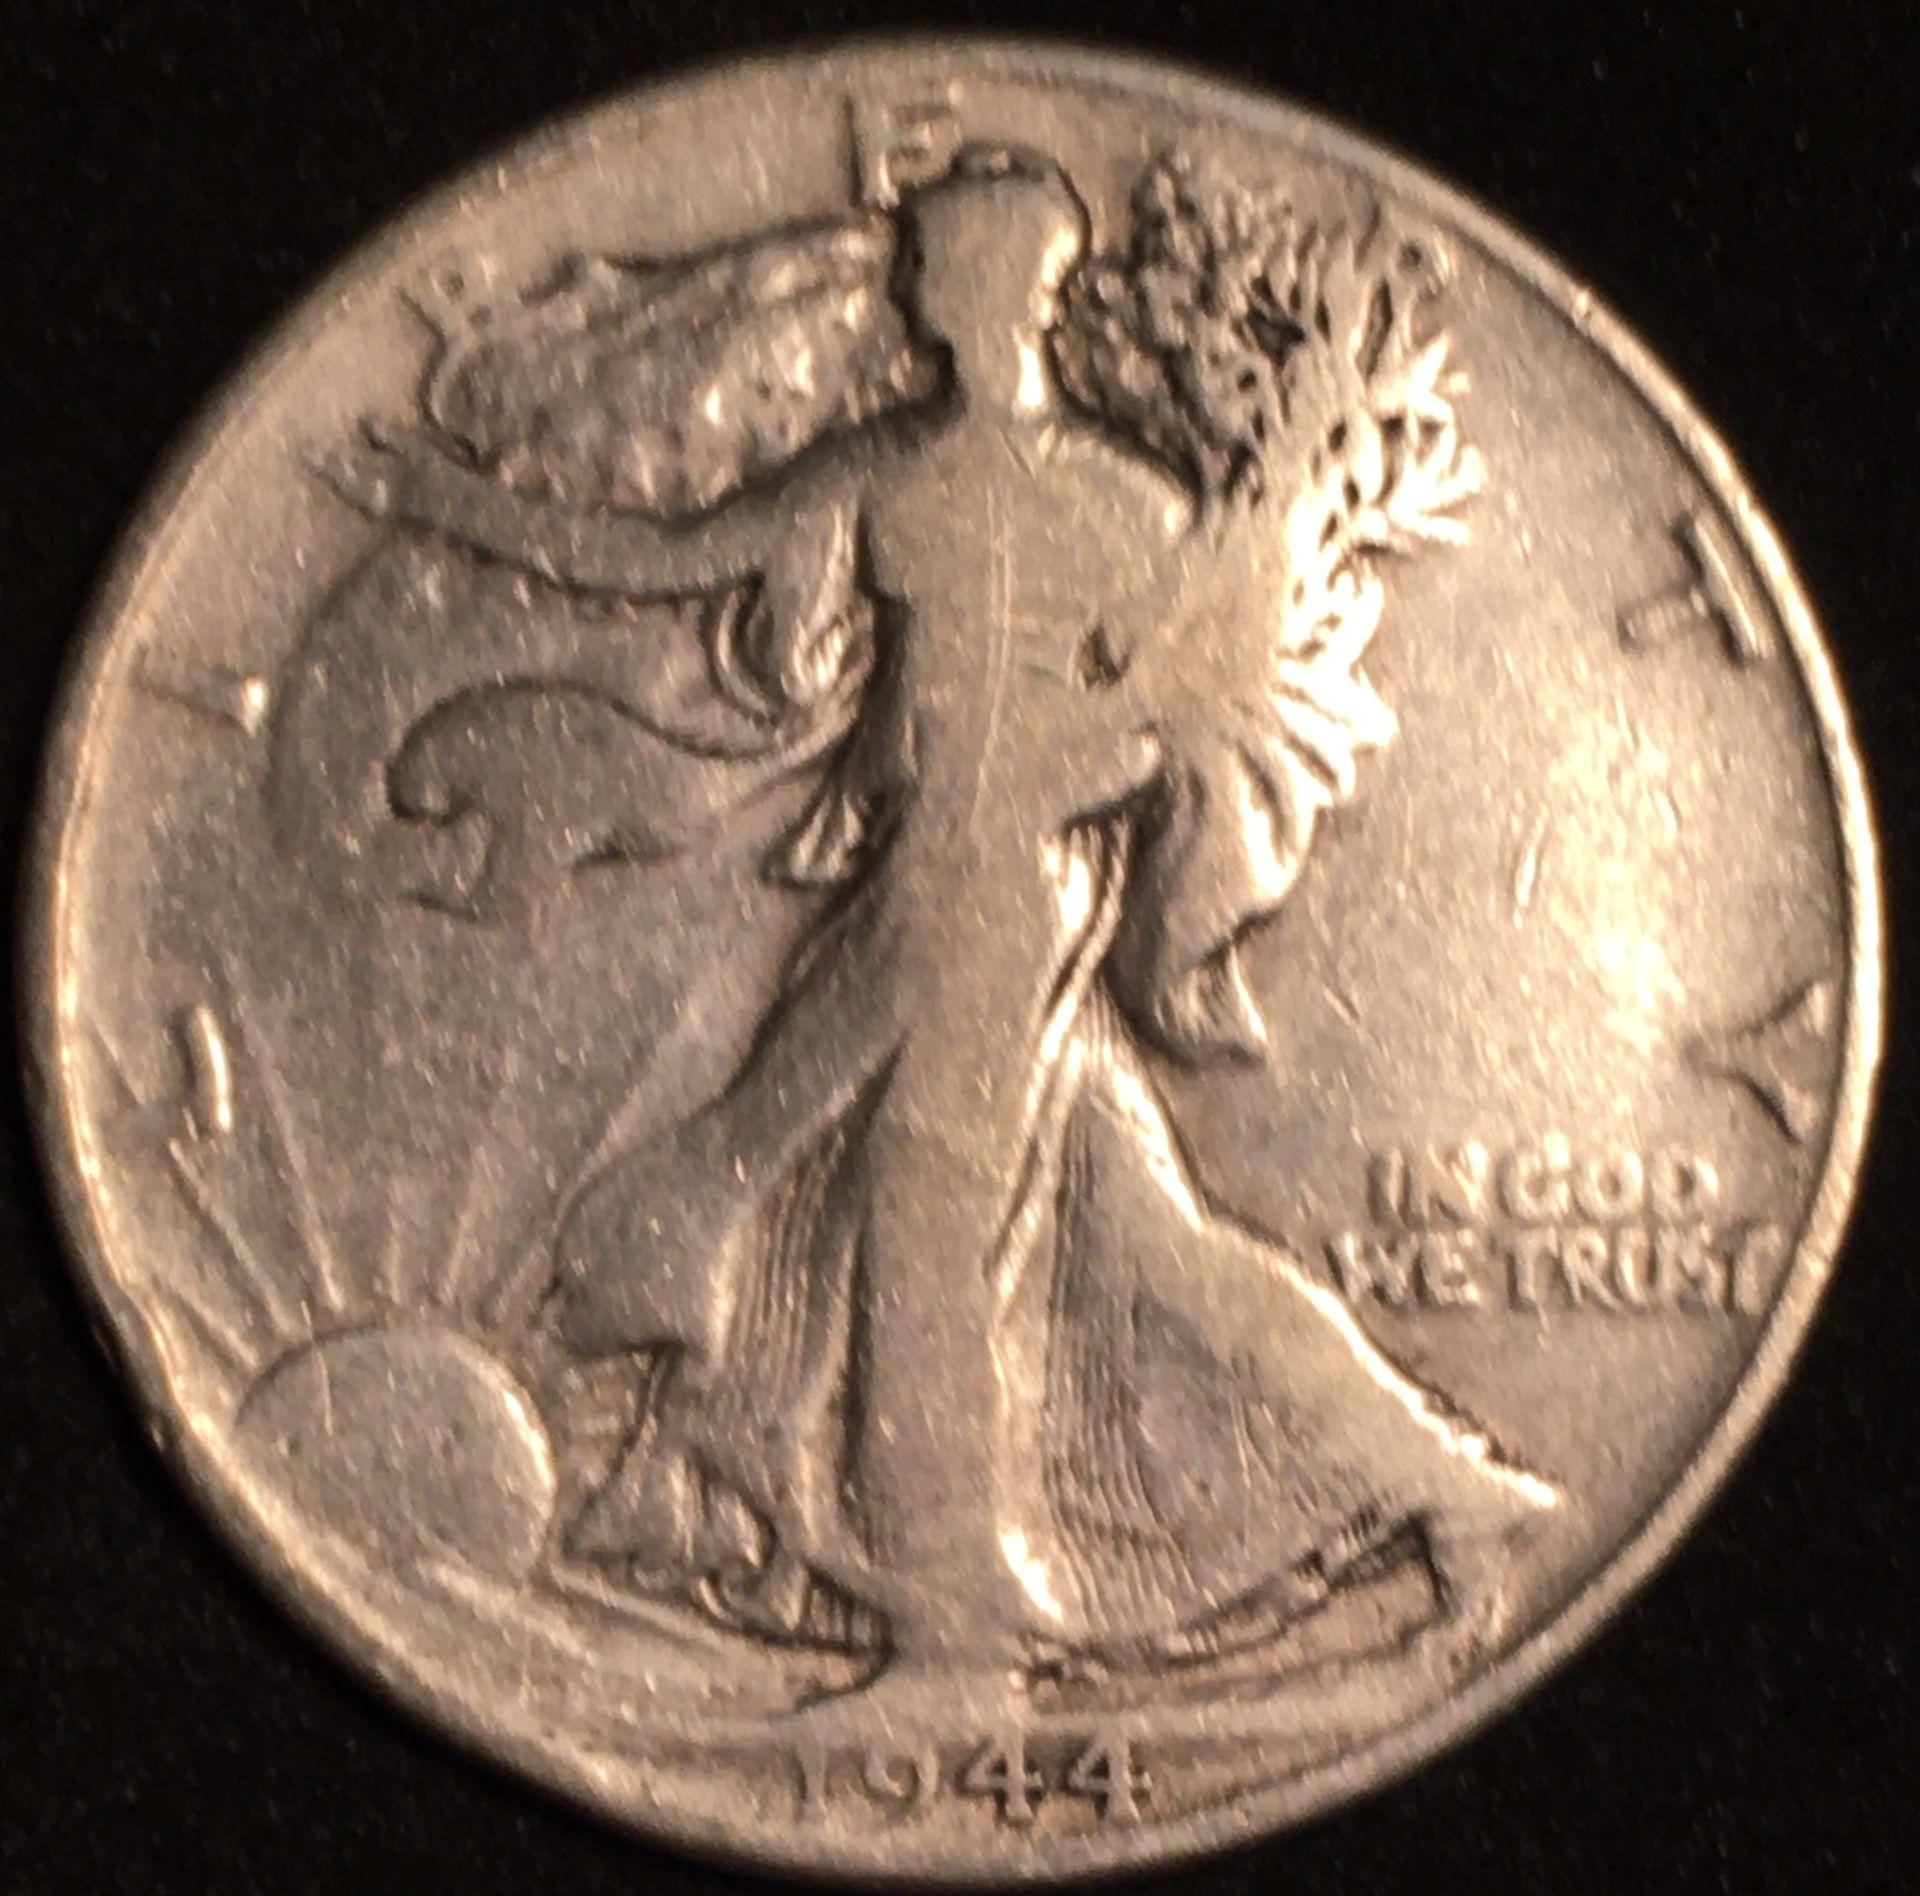 Silver 1944 Walking Liberty Half Dollar